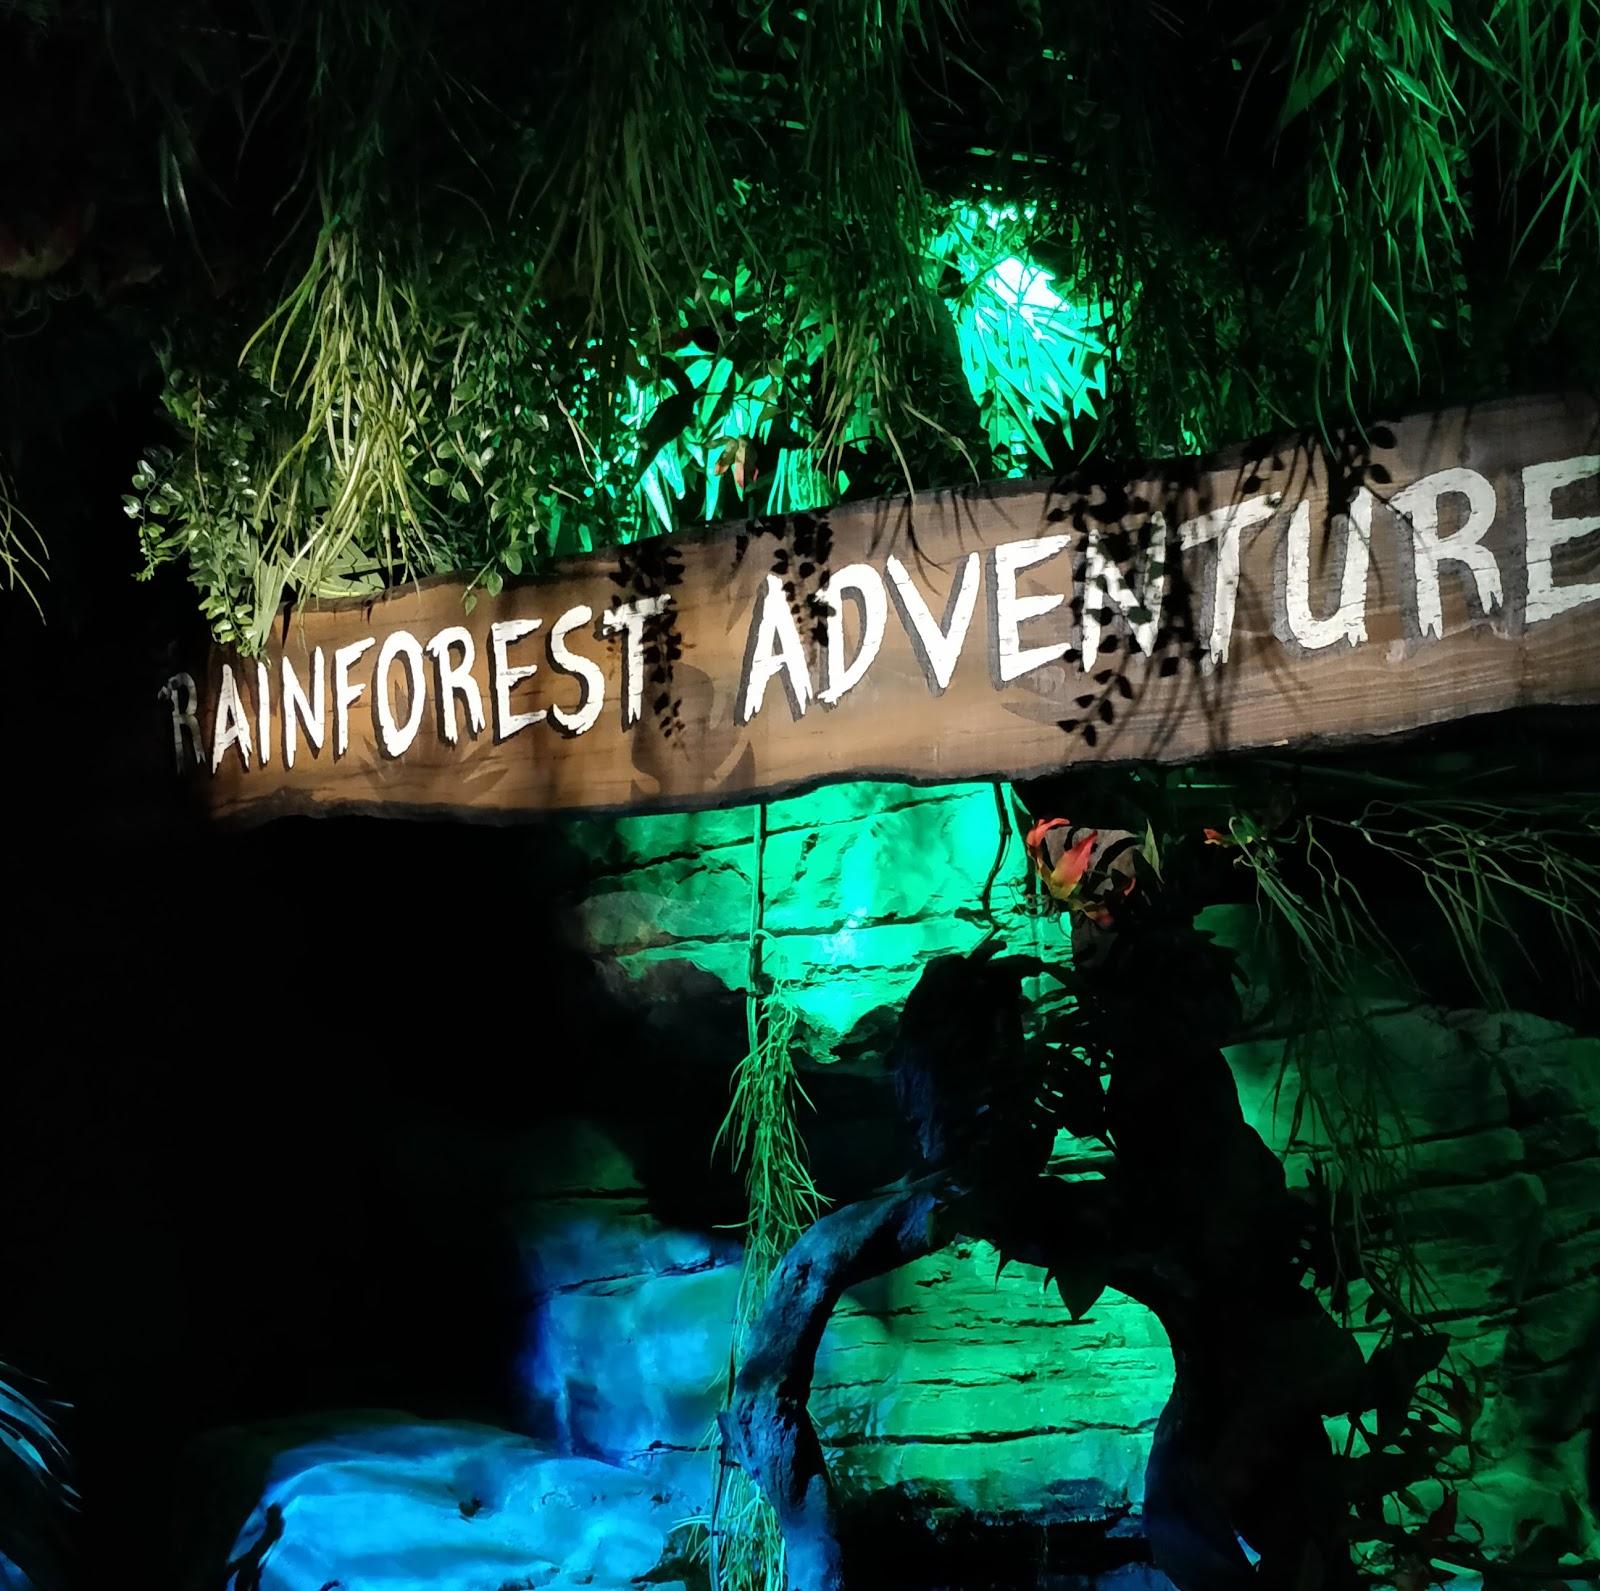 Enjoy a rainforest adventure at sea life london aquarium for Rainforest londra